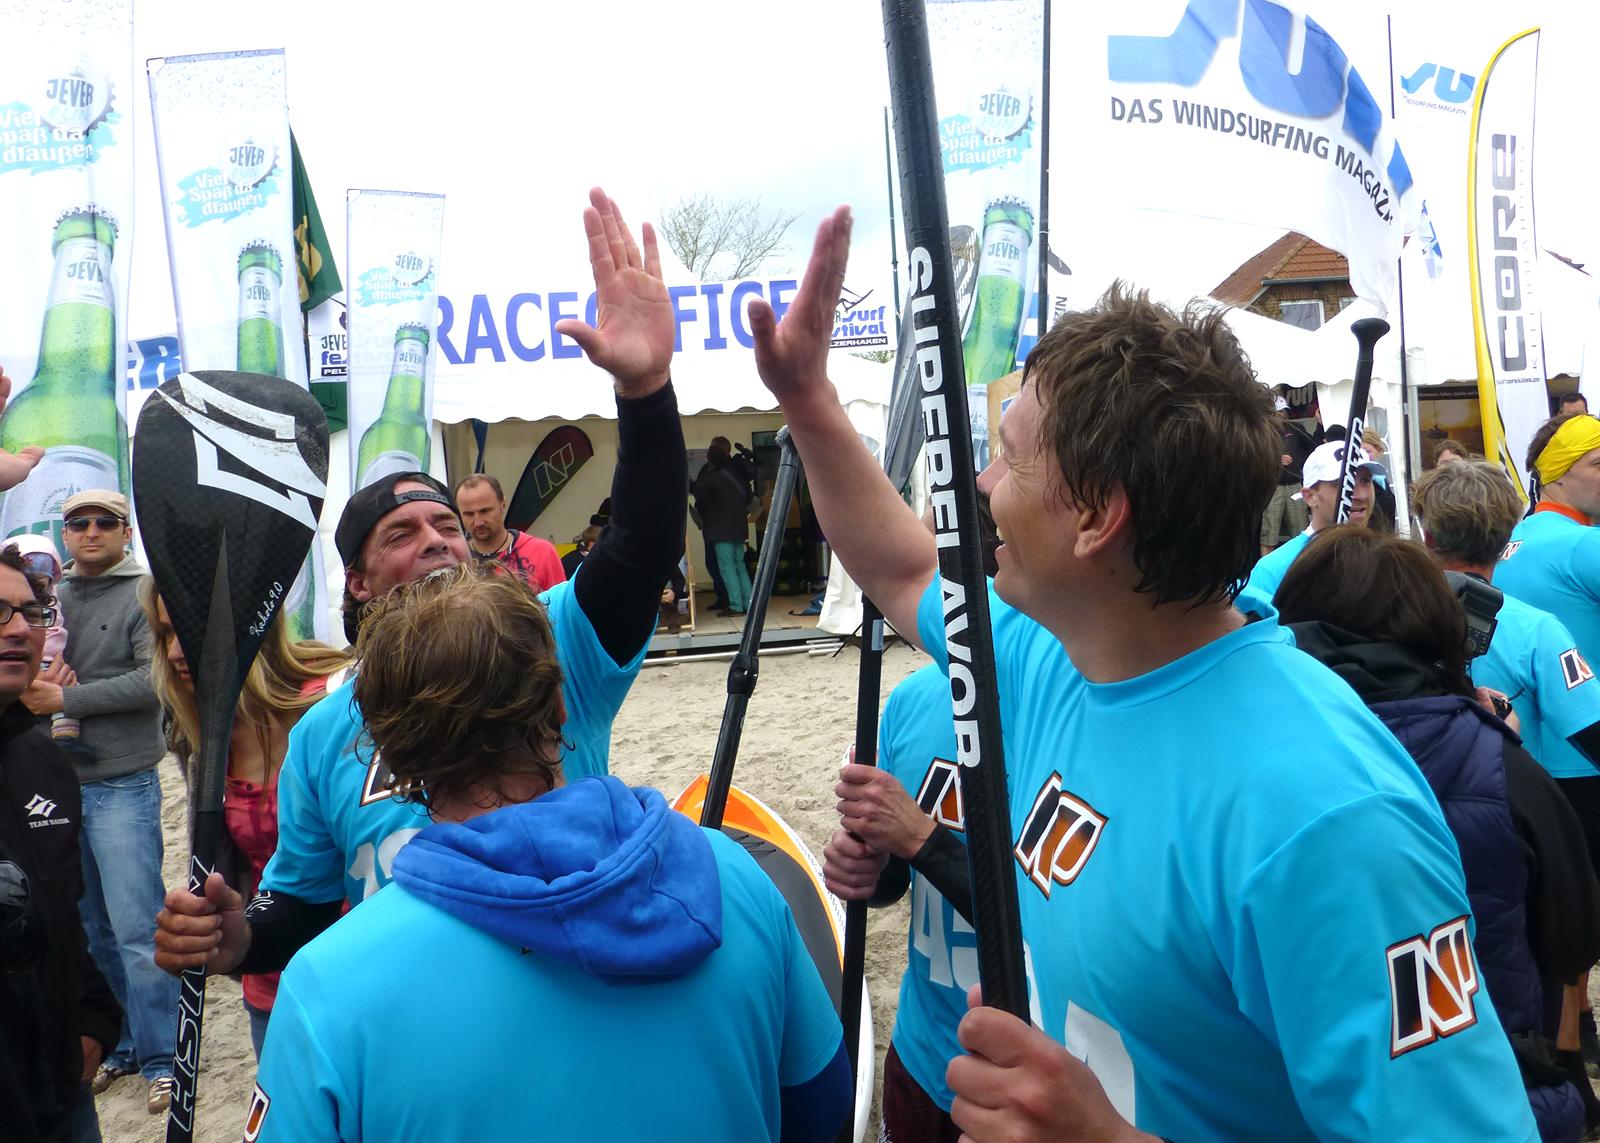 np sup trophy surf festival pelzerhaken 14